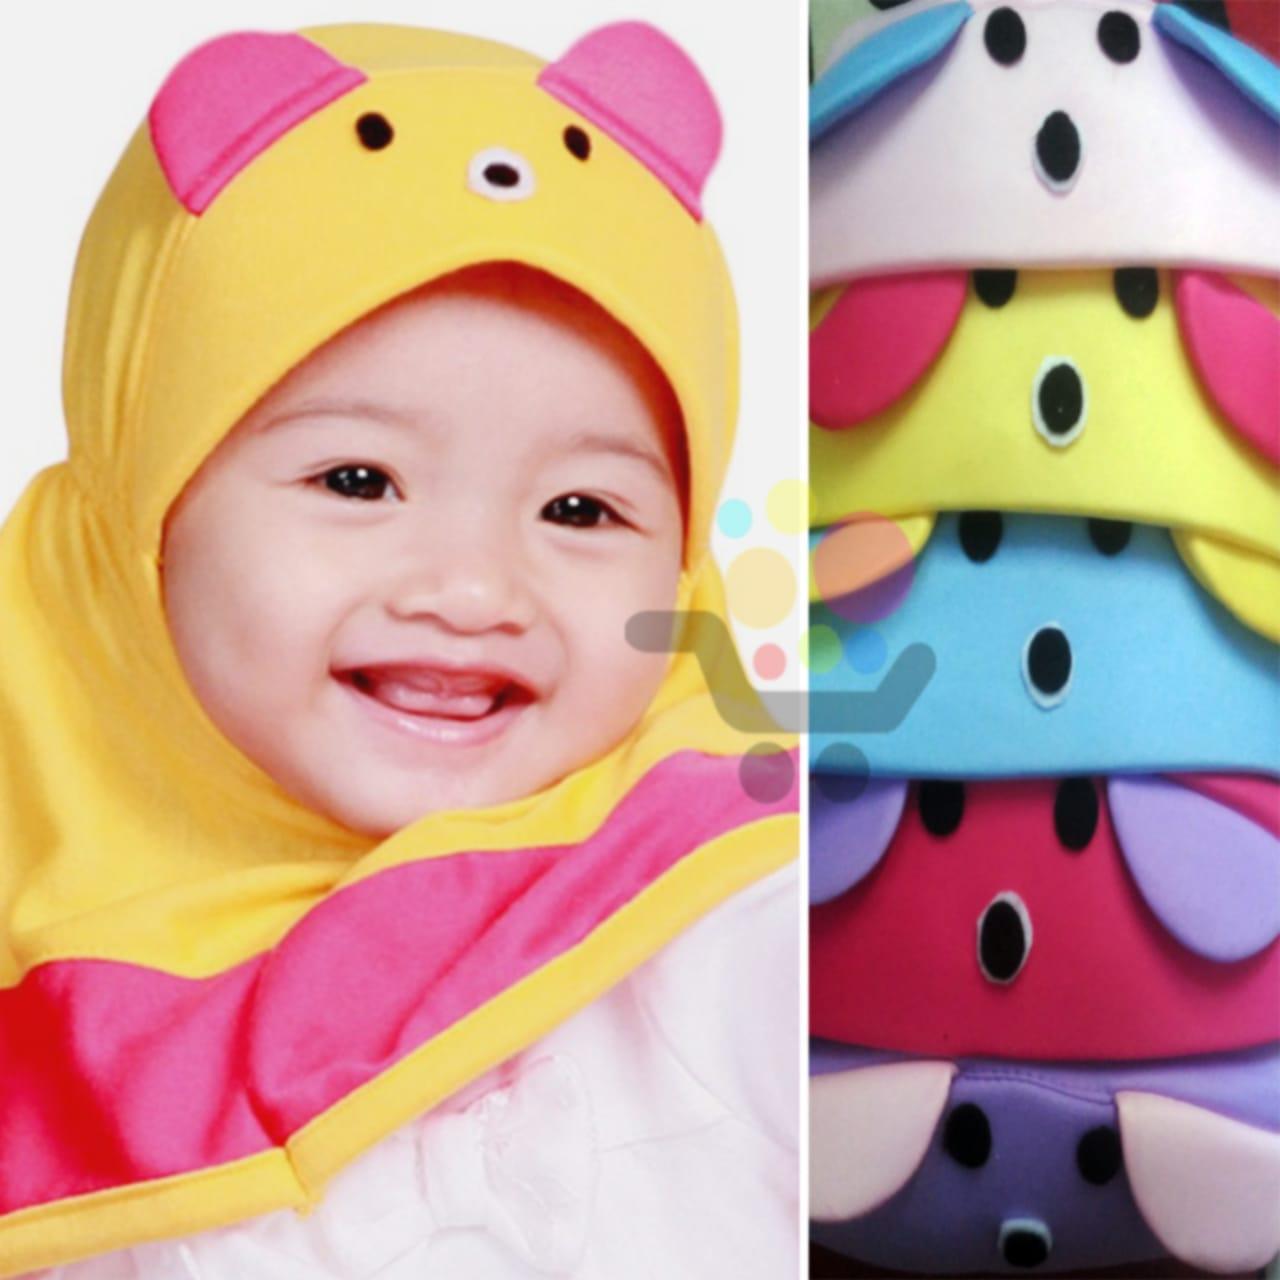 3 pcs Grosir Hijab Anak Mutiara panda / Jilbab Anak Bayi / Jilbab Bayi / Hijab